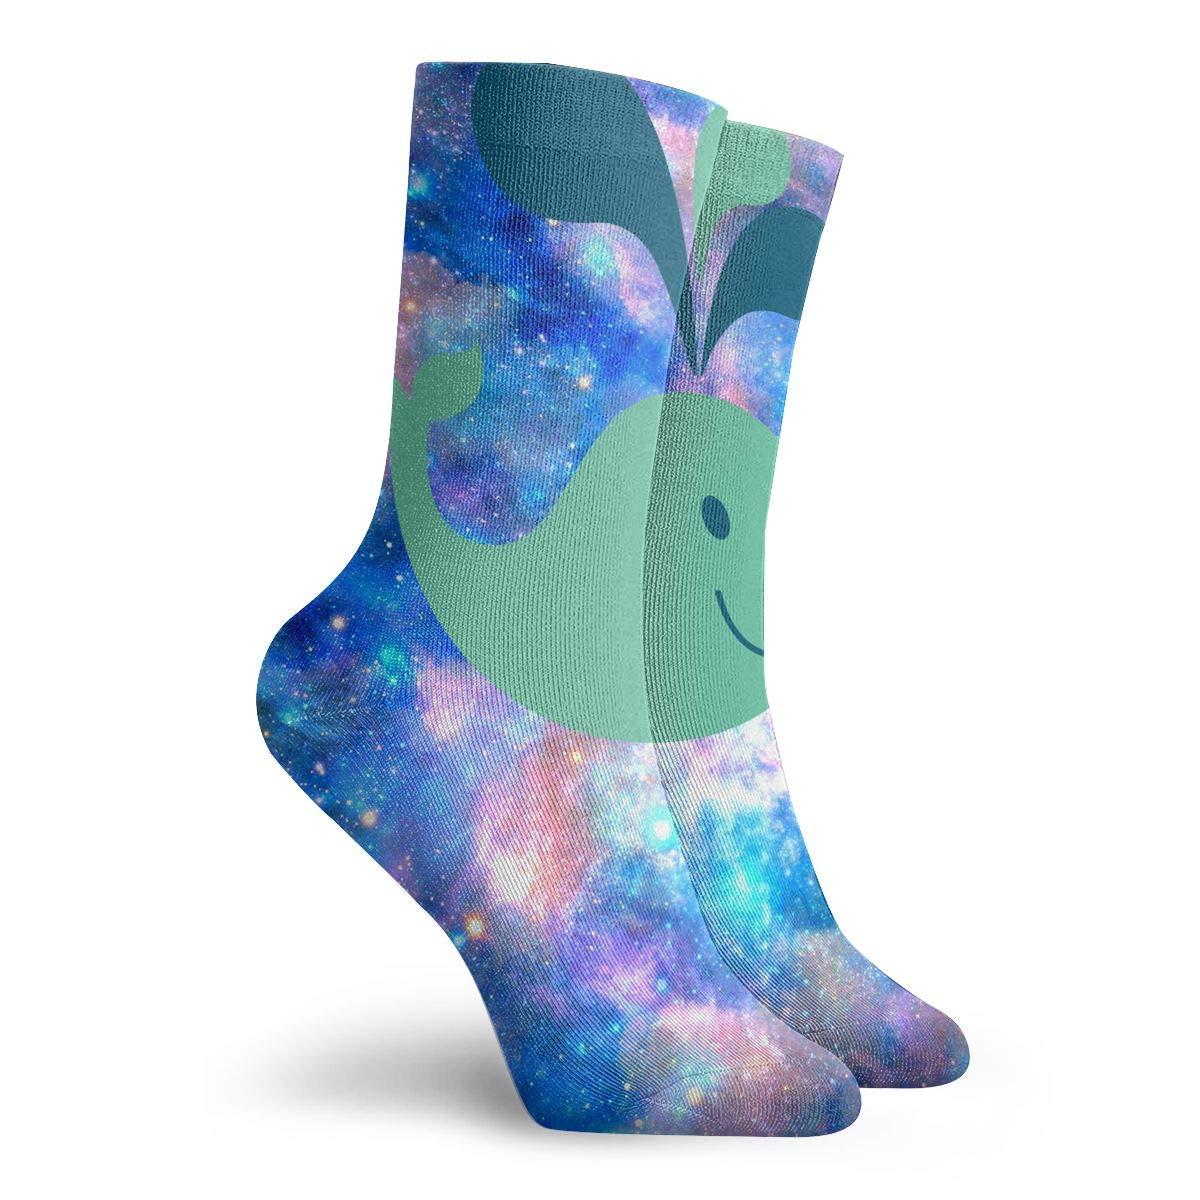 Whale Clip Art Fashion Dress Socks Short Socks Leisure Travel 11.8 Inch